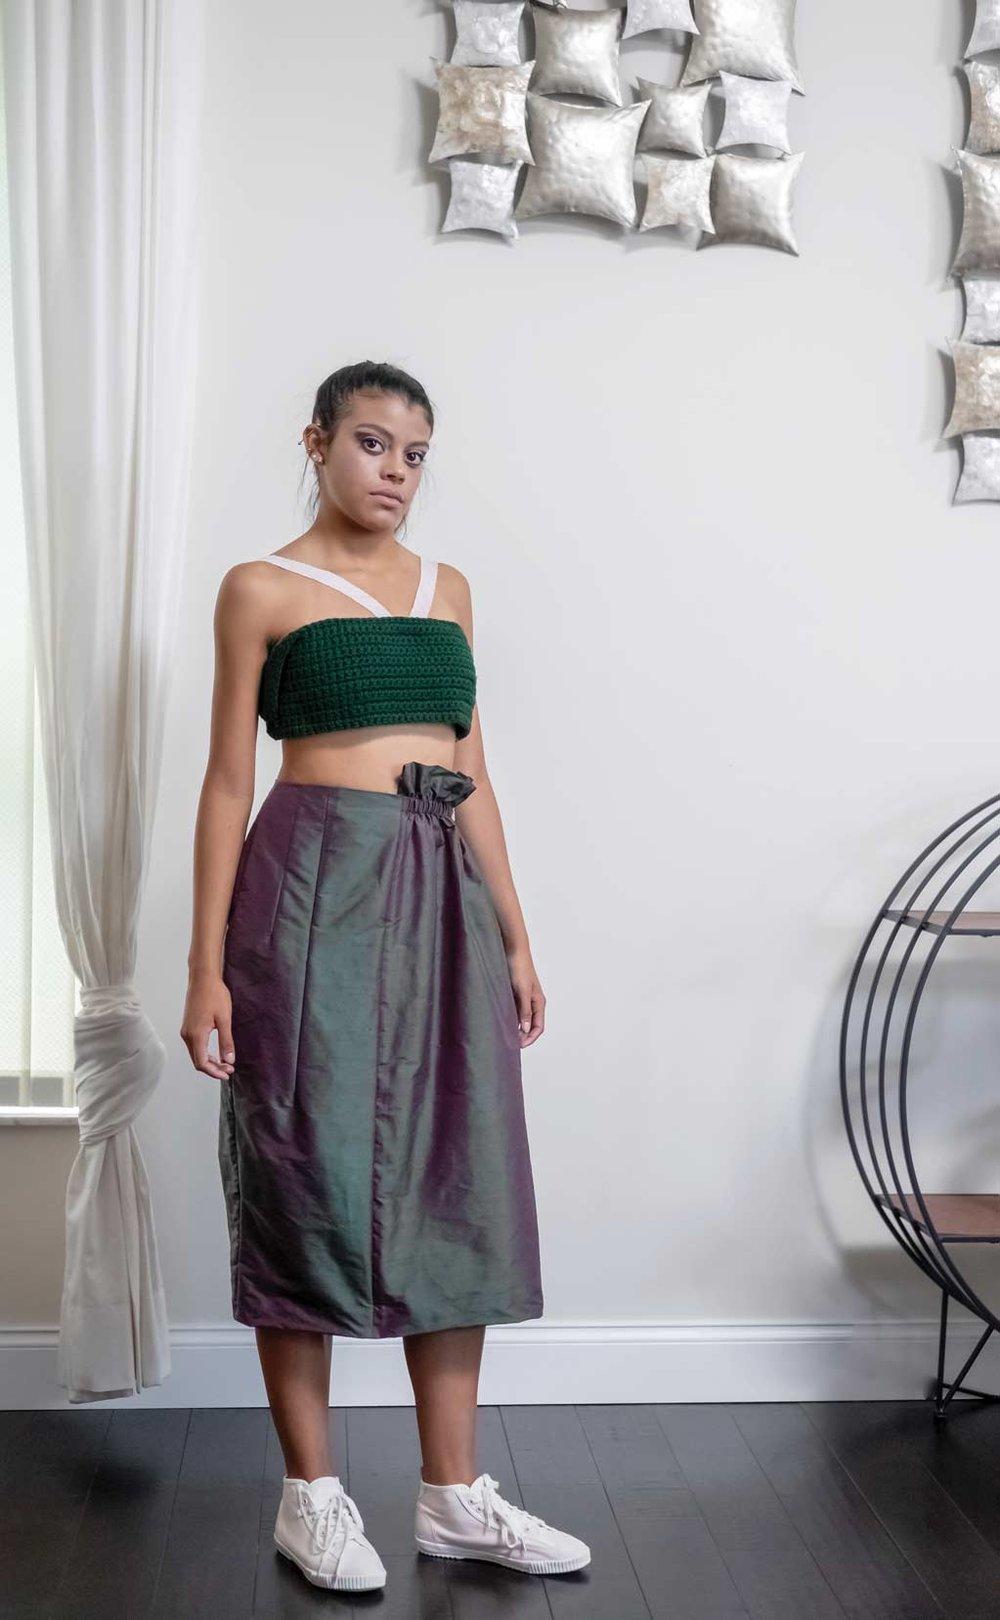 amz-mary-crop-marlene-seta-skirt.jpg